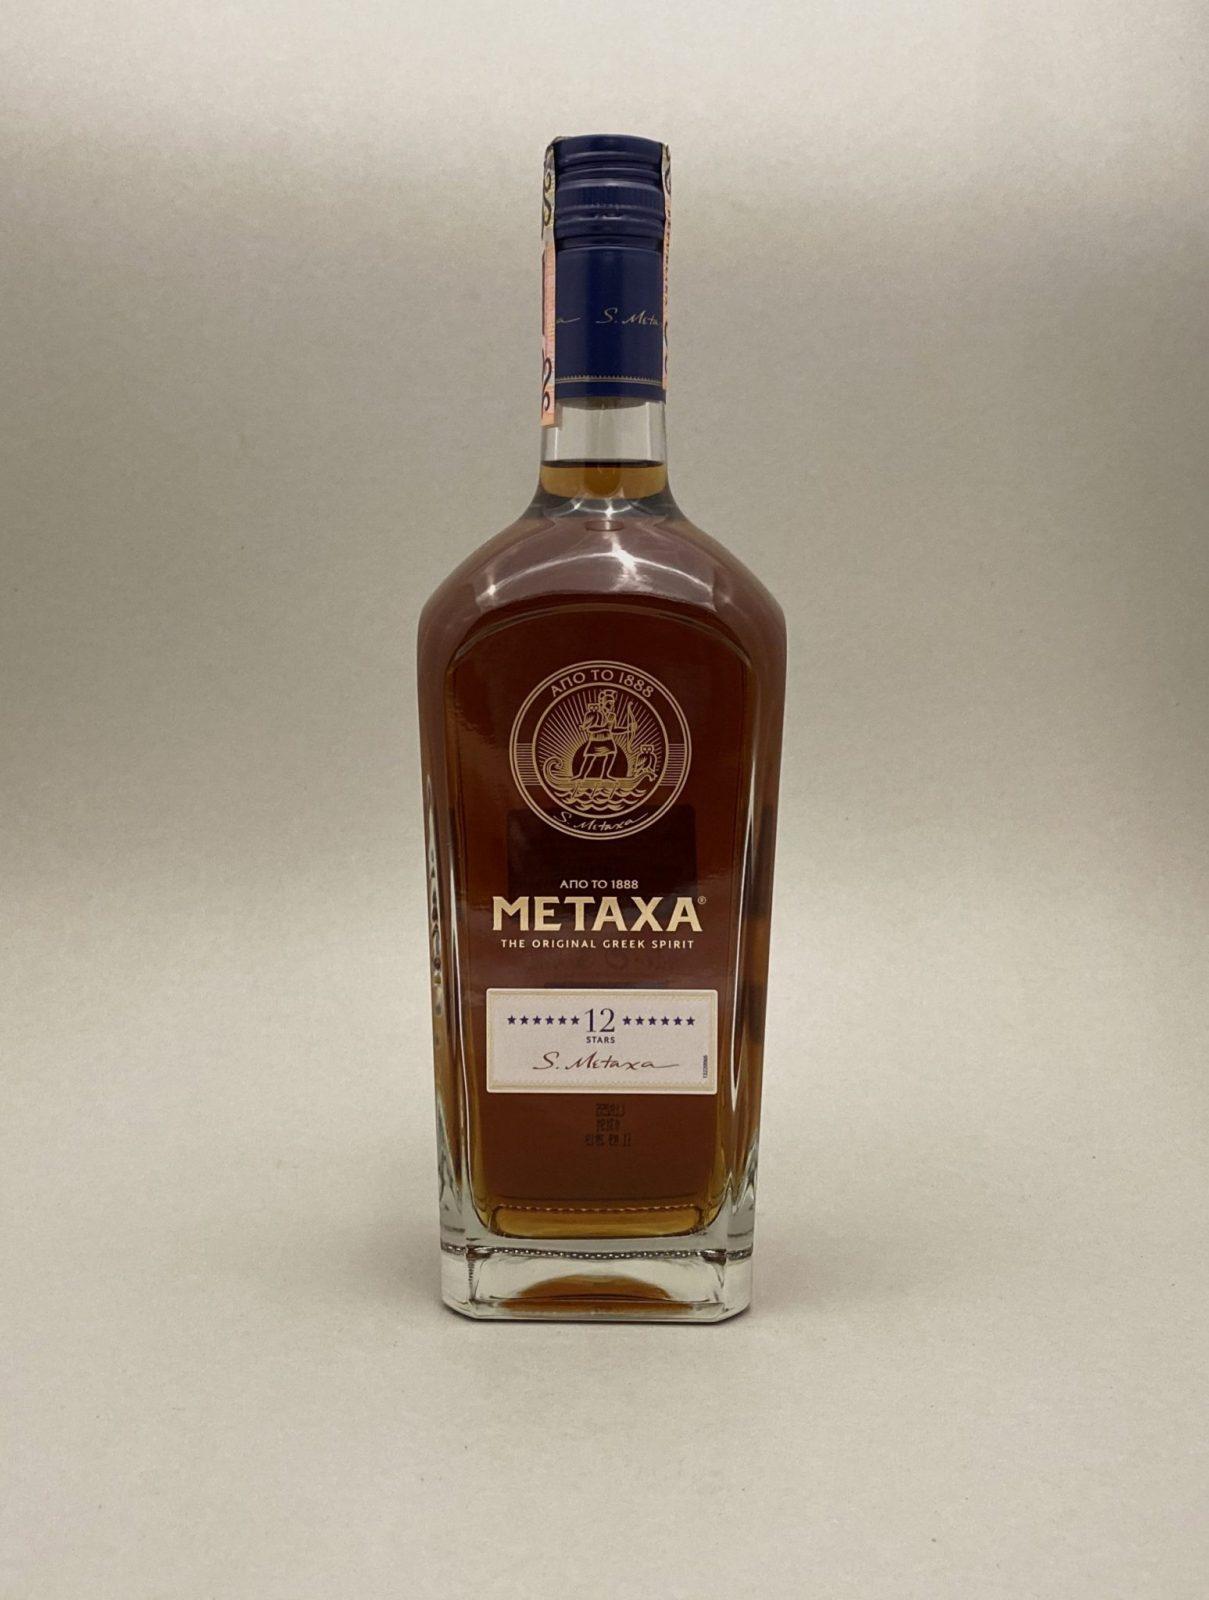 Metaxa 12 40%, Bottleshop Sunny wines slnecnice mesto, petrzalka, koňak, rozvoz alkoholu, eshop